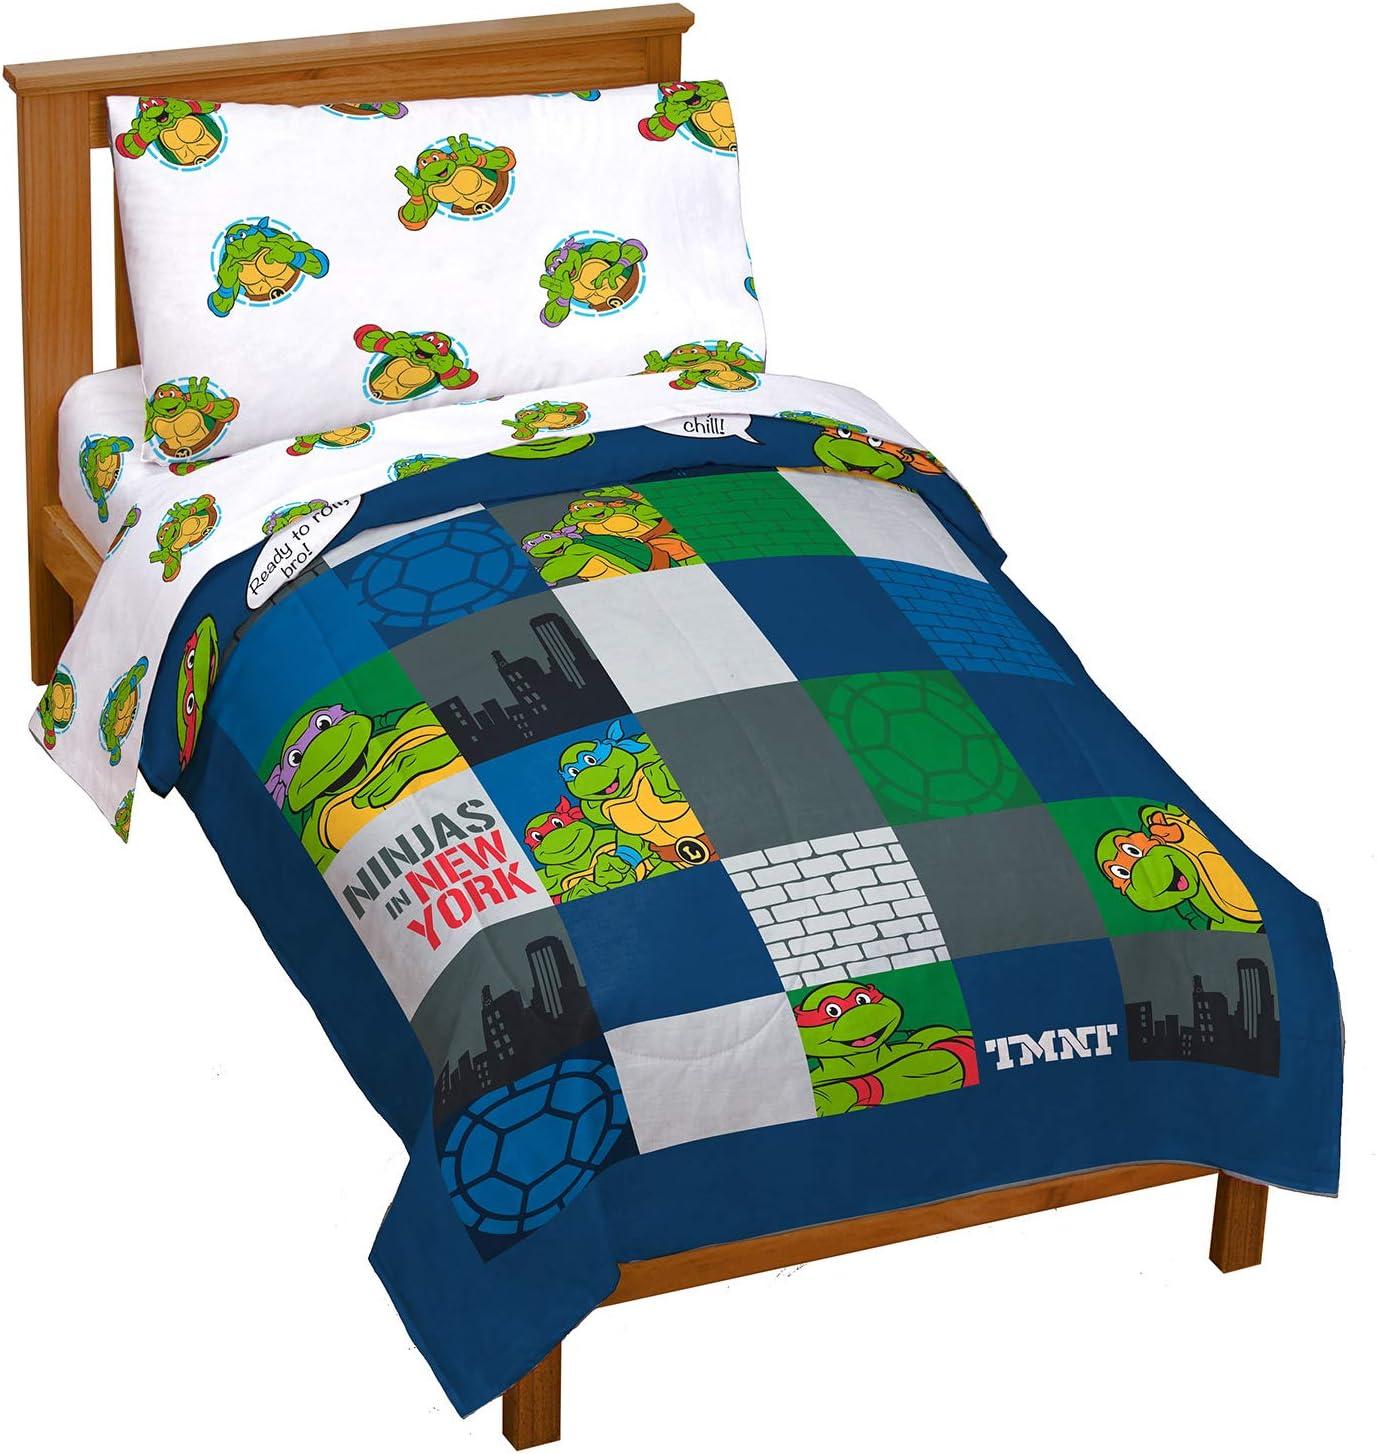 Nickelodeon Teenage Mutant Ninja Turtles NY Ninjas 4 Piece Toddler Bed Set - Includes Reversible Comforter & Sheet Set Bedding - Super Soft Fade Resistant Microfiber (Official Nickelodeon Product)